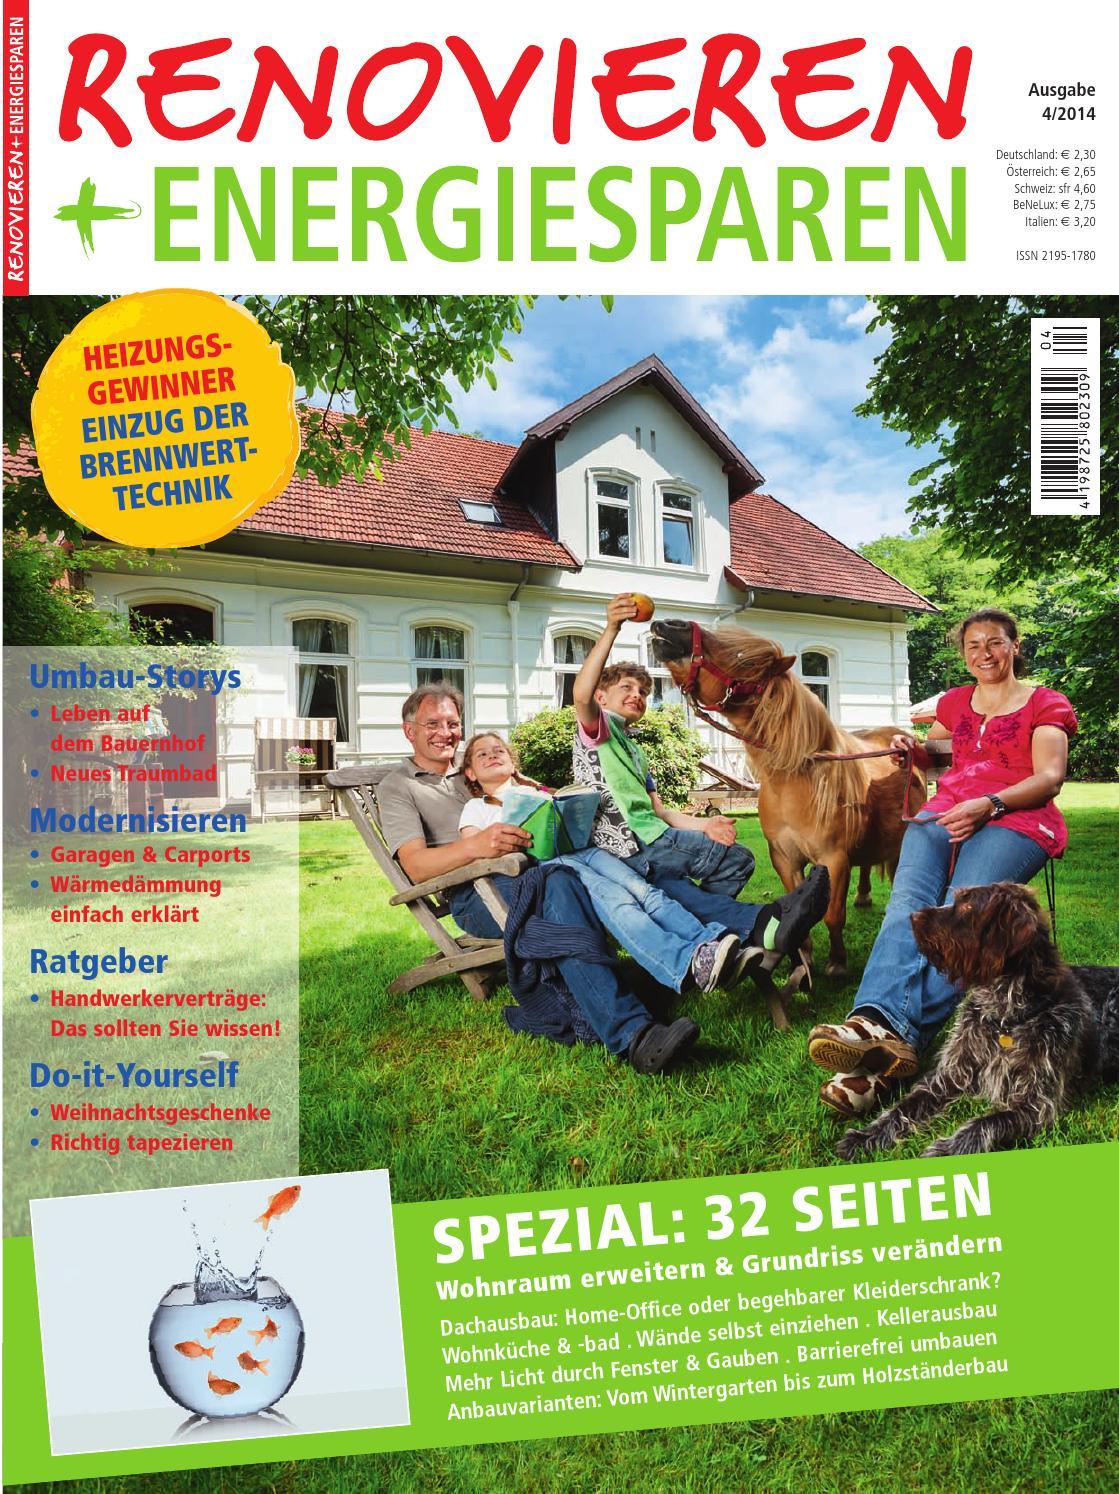 Renovieren U0026 Energiesparen 4/2014 By Family Home Verlag GmbH   Issuu